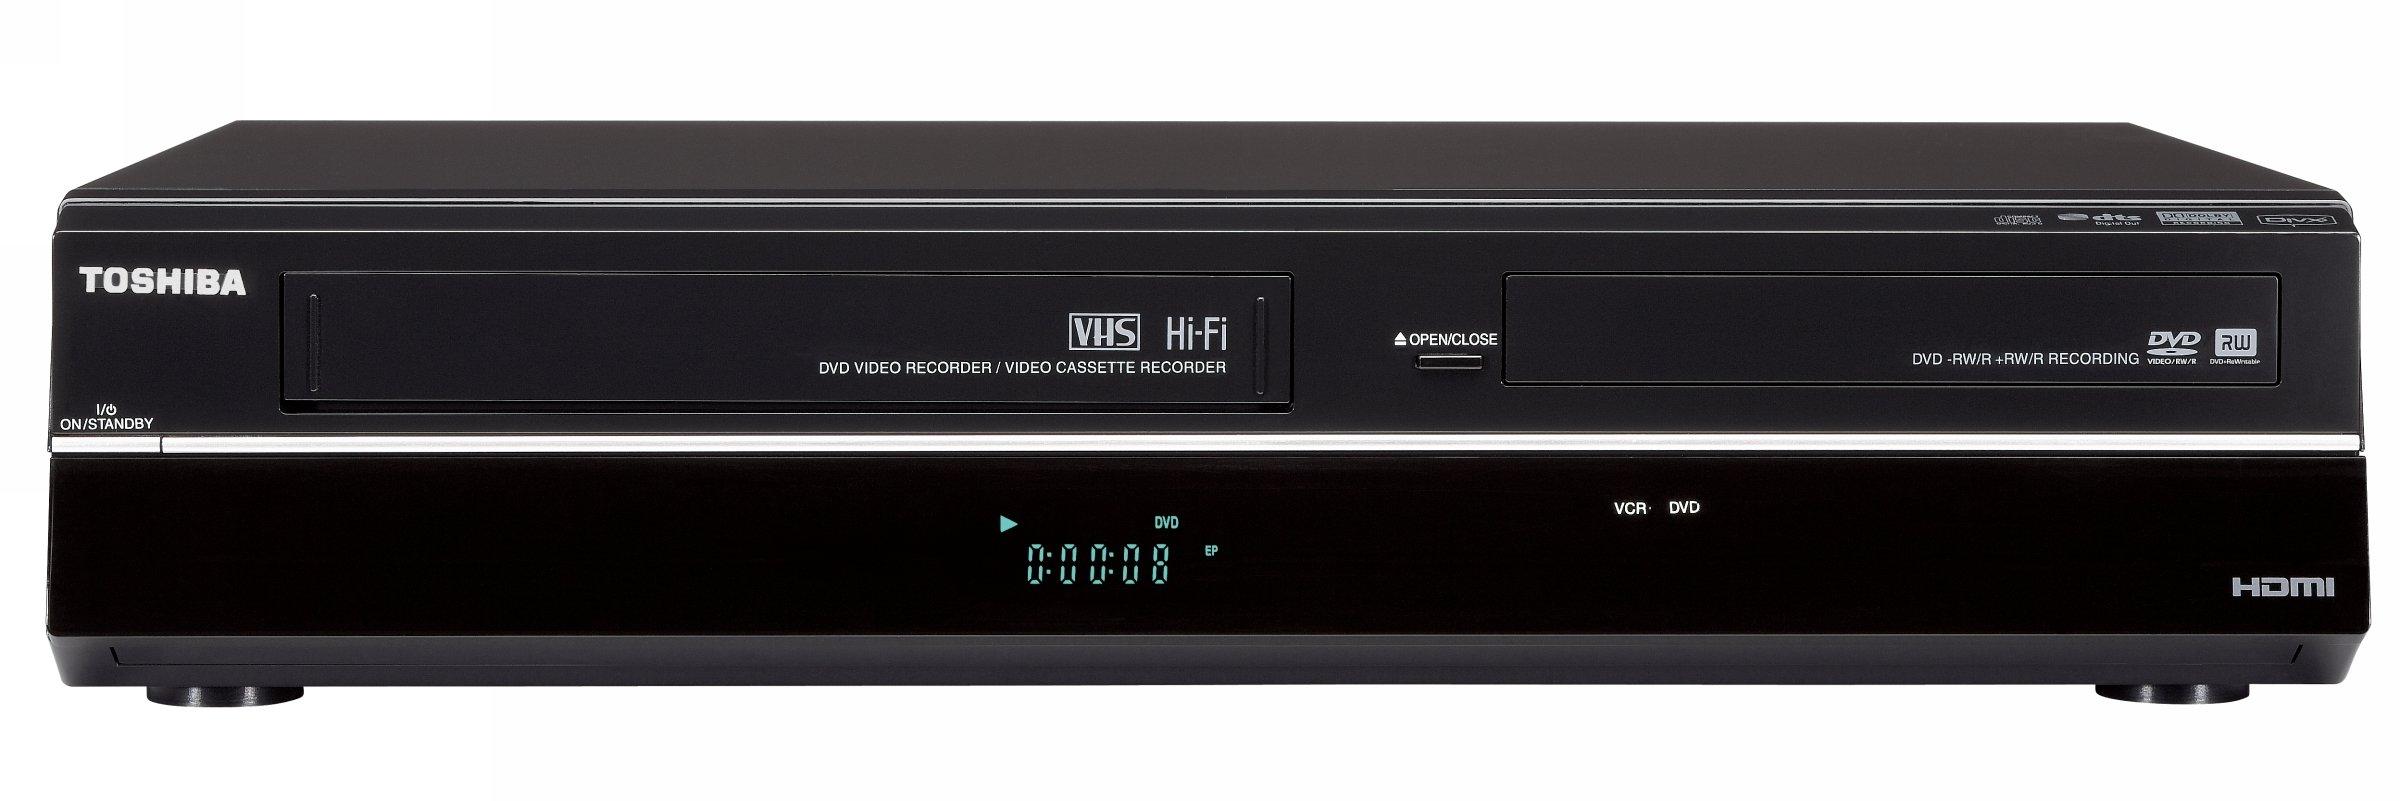 Toshiba DVR670/DVR670KU DVD/VHS Recorder with Built in Tuner, Black (2009 Model)